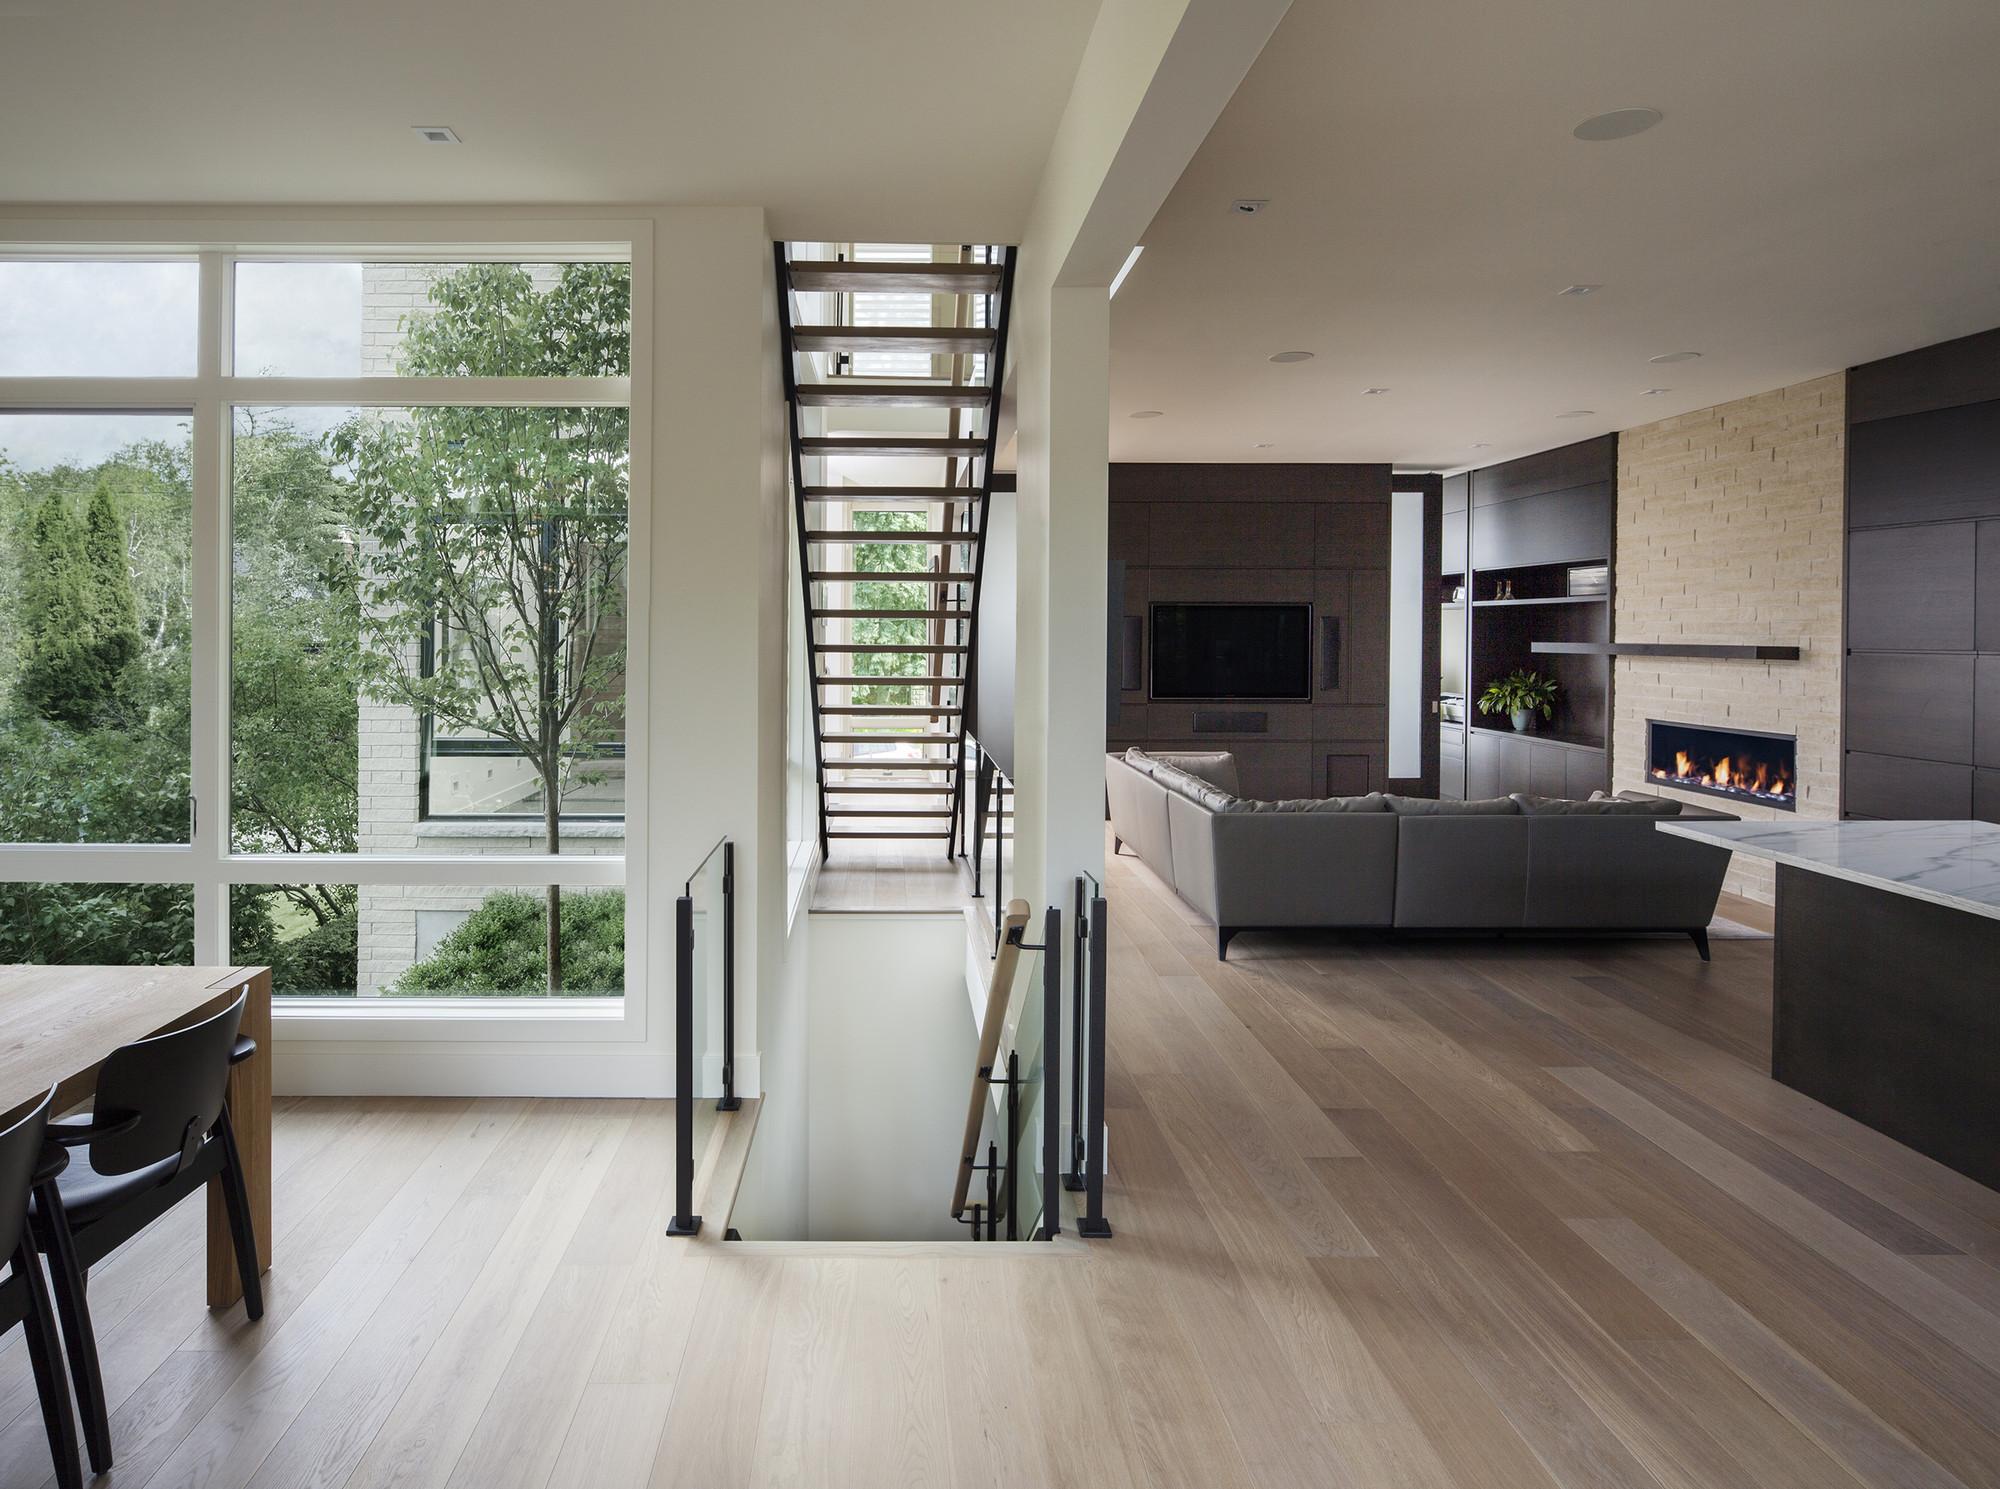 Gallery of westboro home kariouk associates 12 for Modernes haus von innen